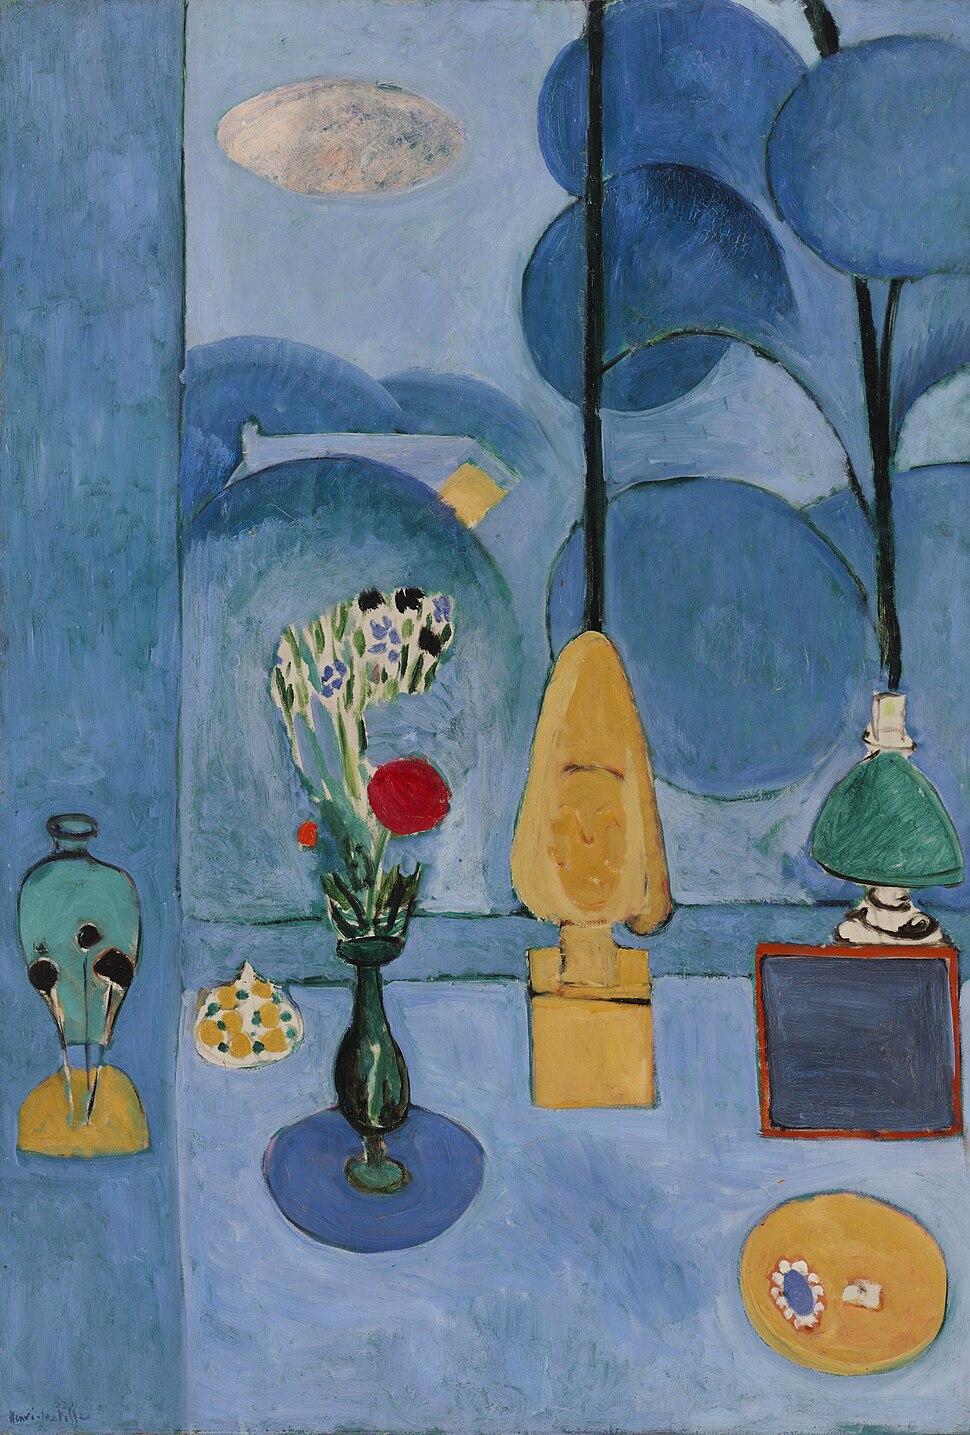 Henri Matisse, 1913, La glace sans tain (The Blue Window), oil on canvas, 130.8 x 90.5 cm, Museum of Modern Art